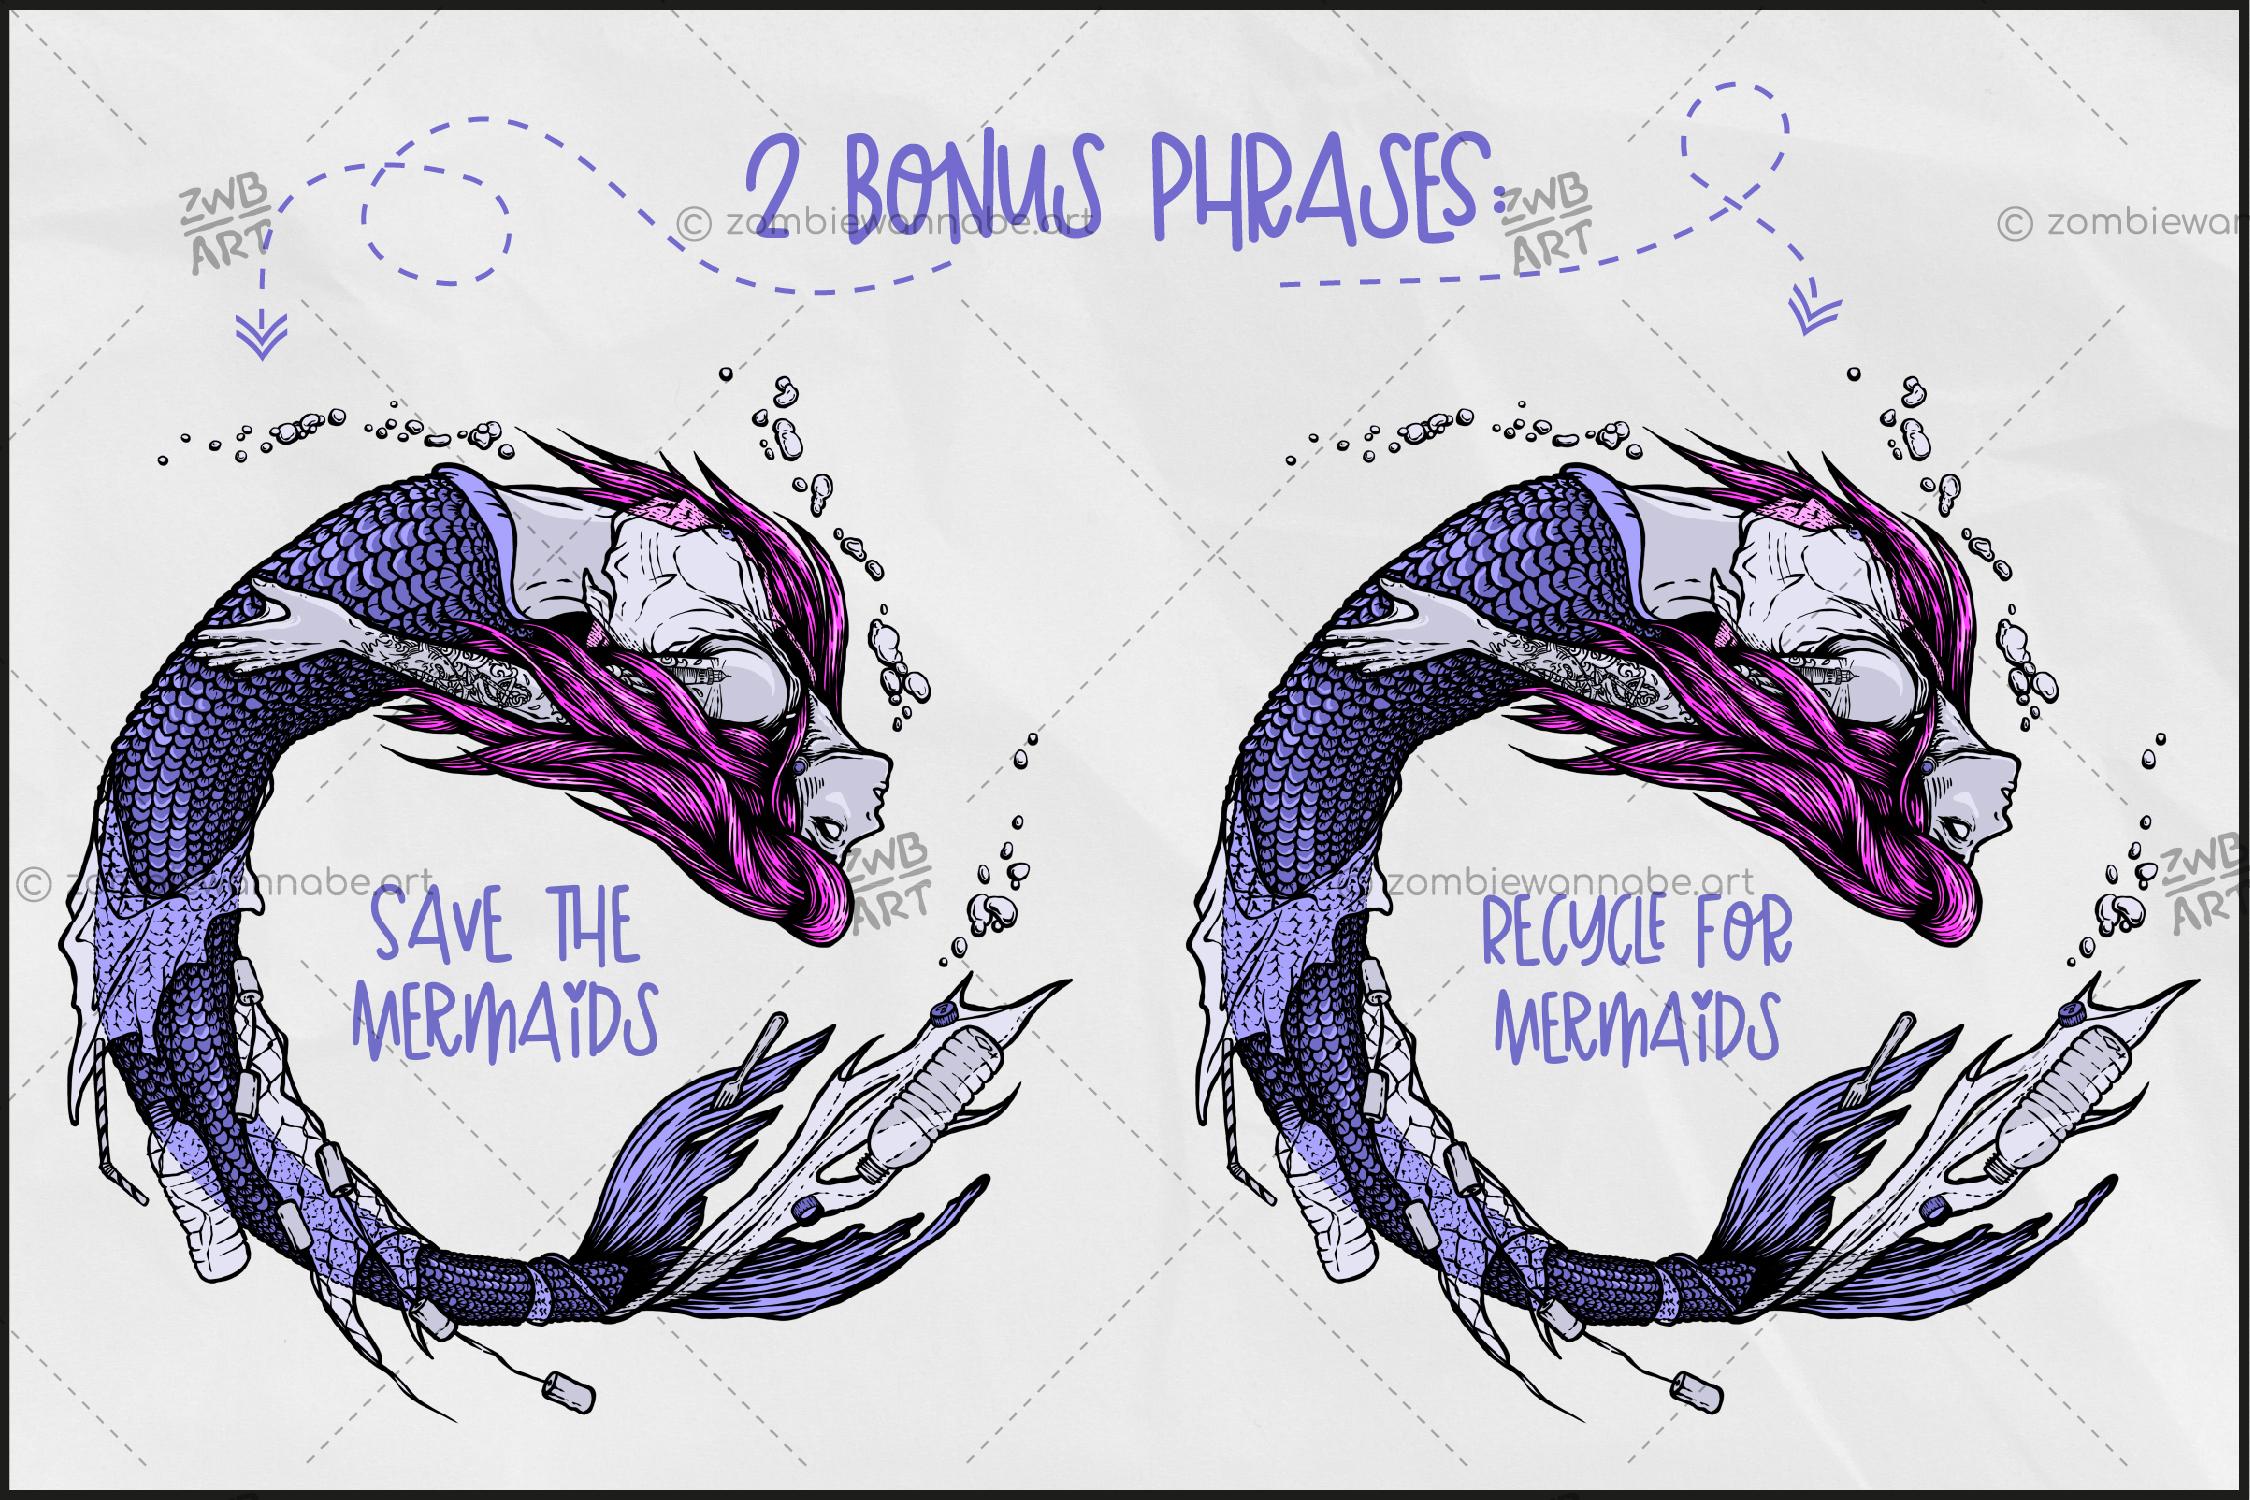 Trash Mermaid - prw5- live on DesignBundles.net